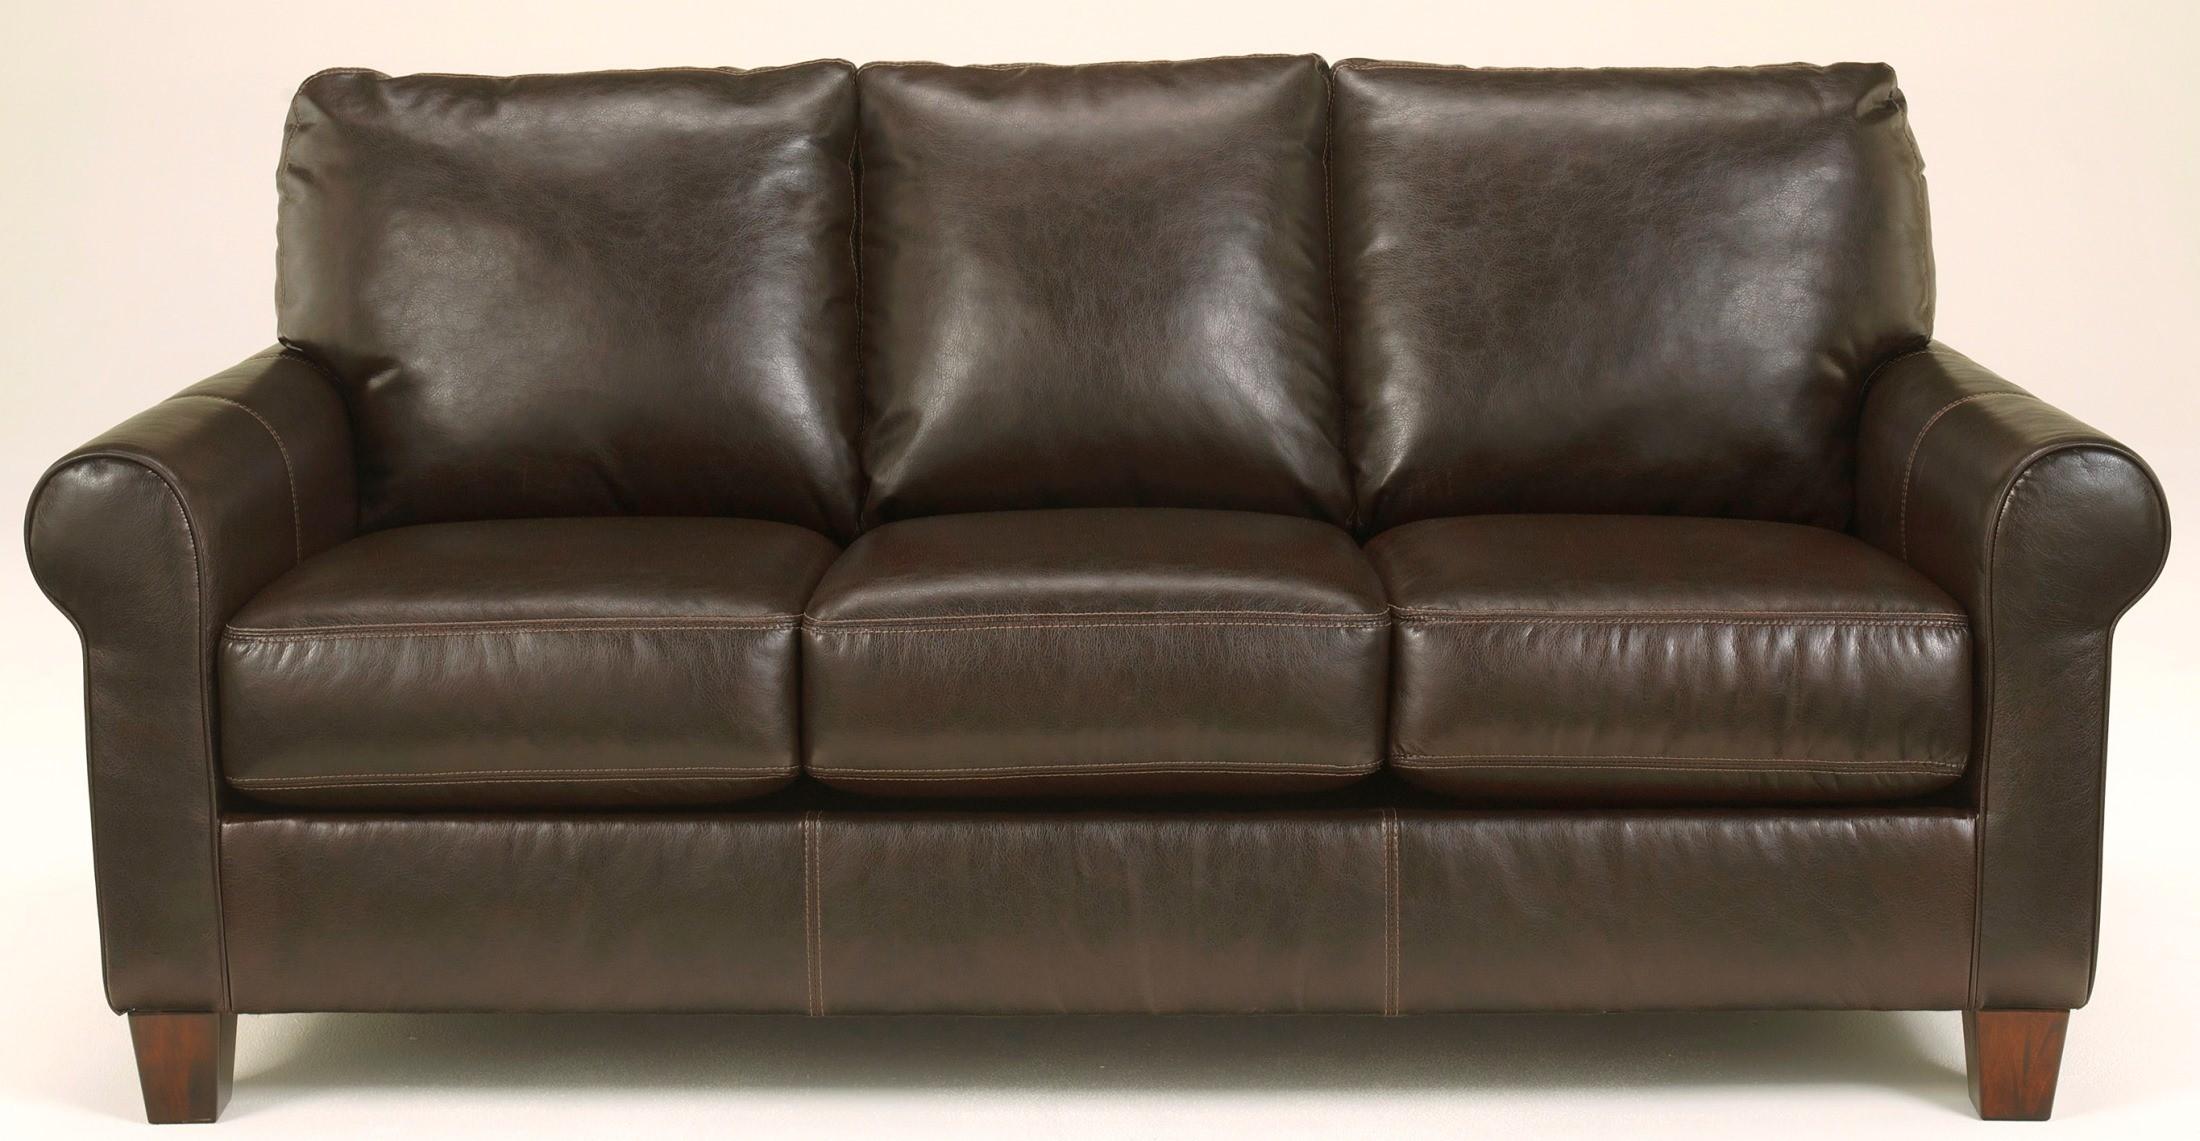 ashley furniture durablend sleeper sofa how to make cushions covers nastas bark full from